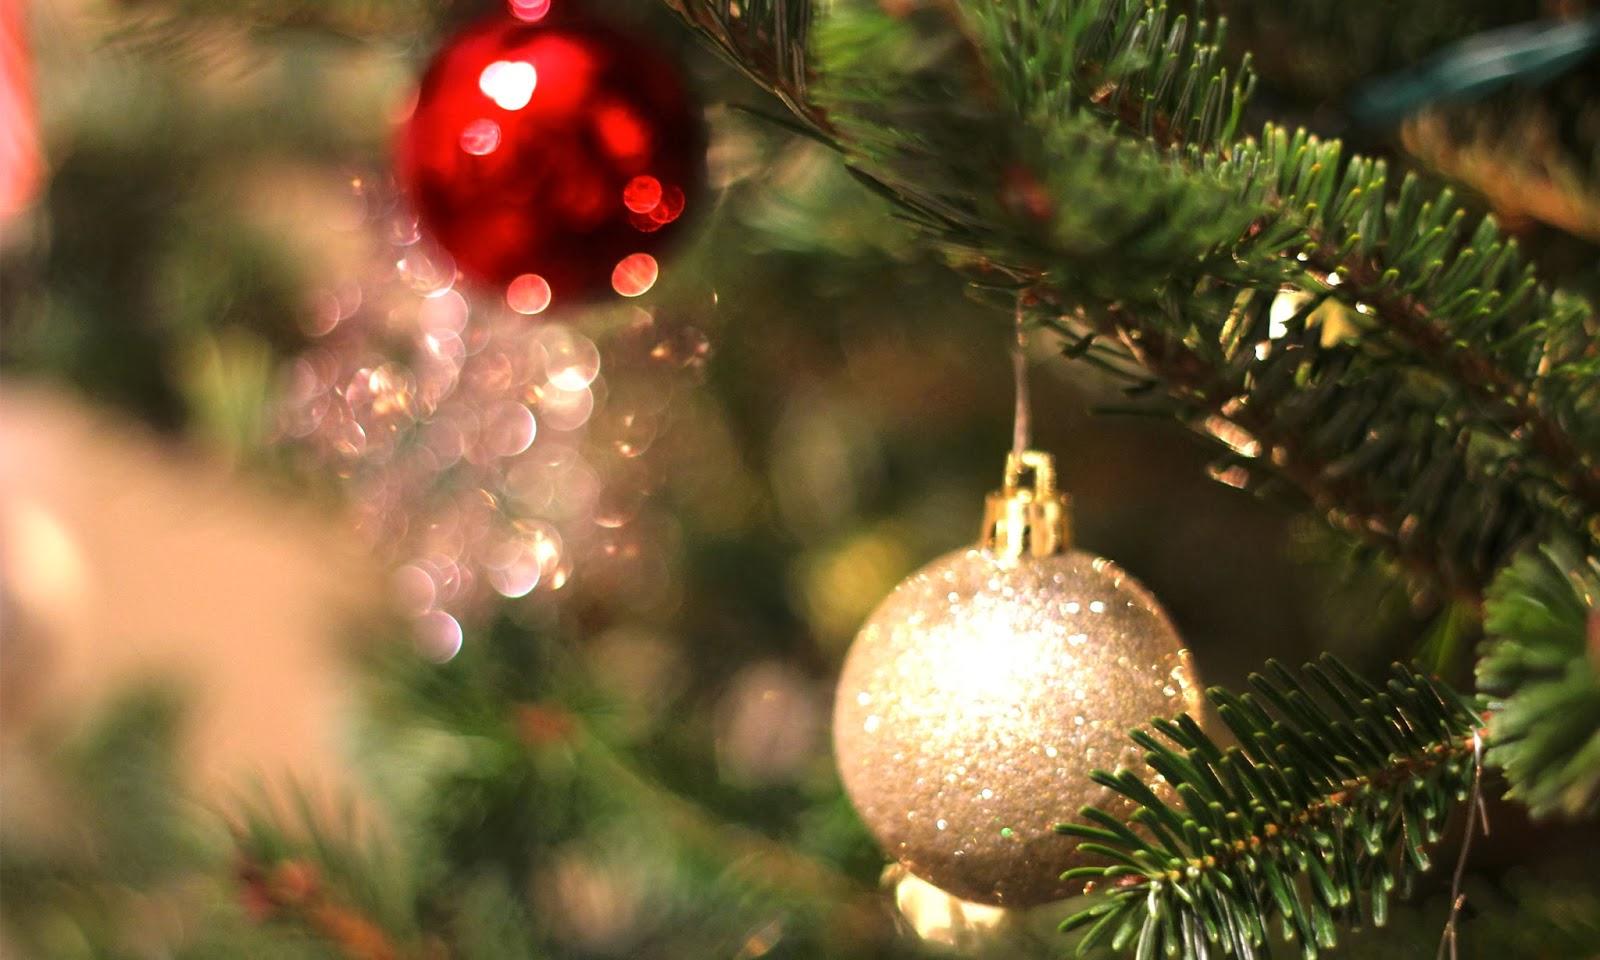 Christmas Photography Hd Wallpapers Hd Wallpapers High